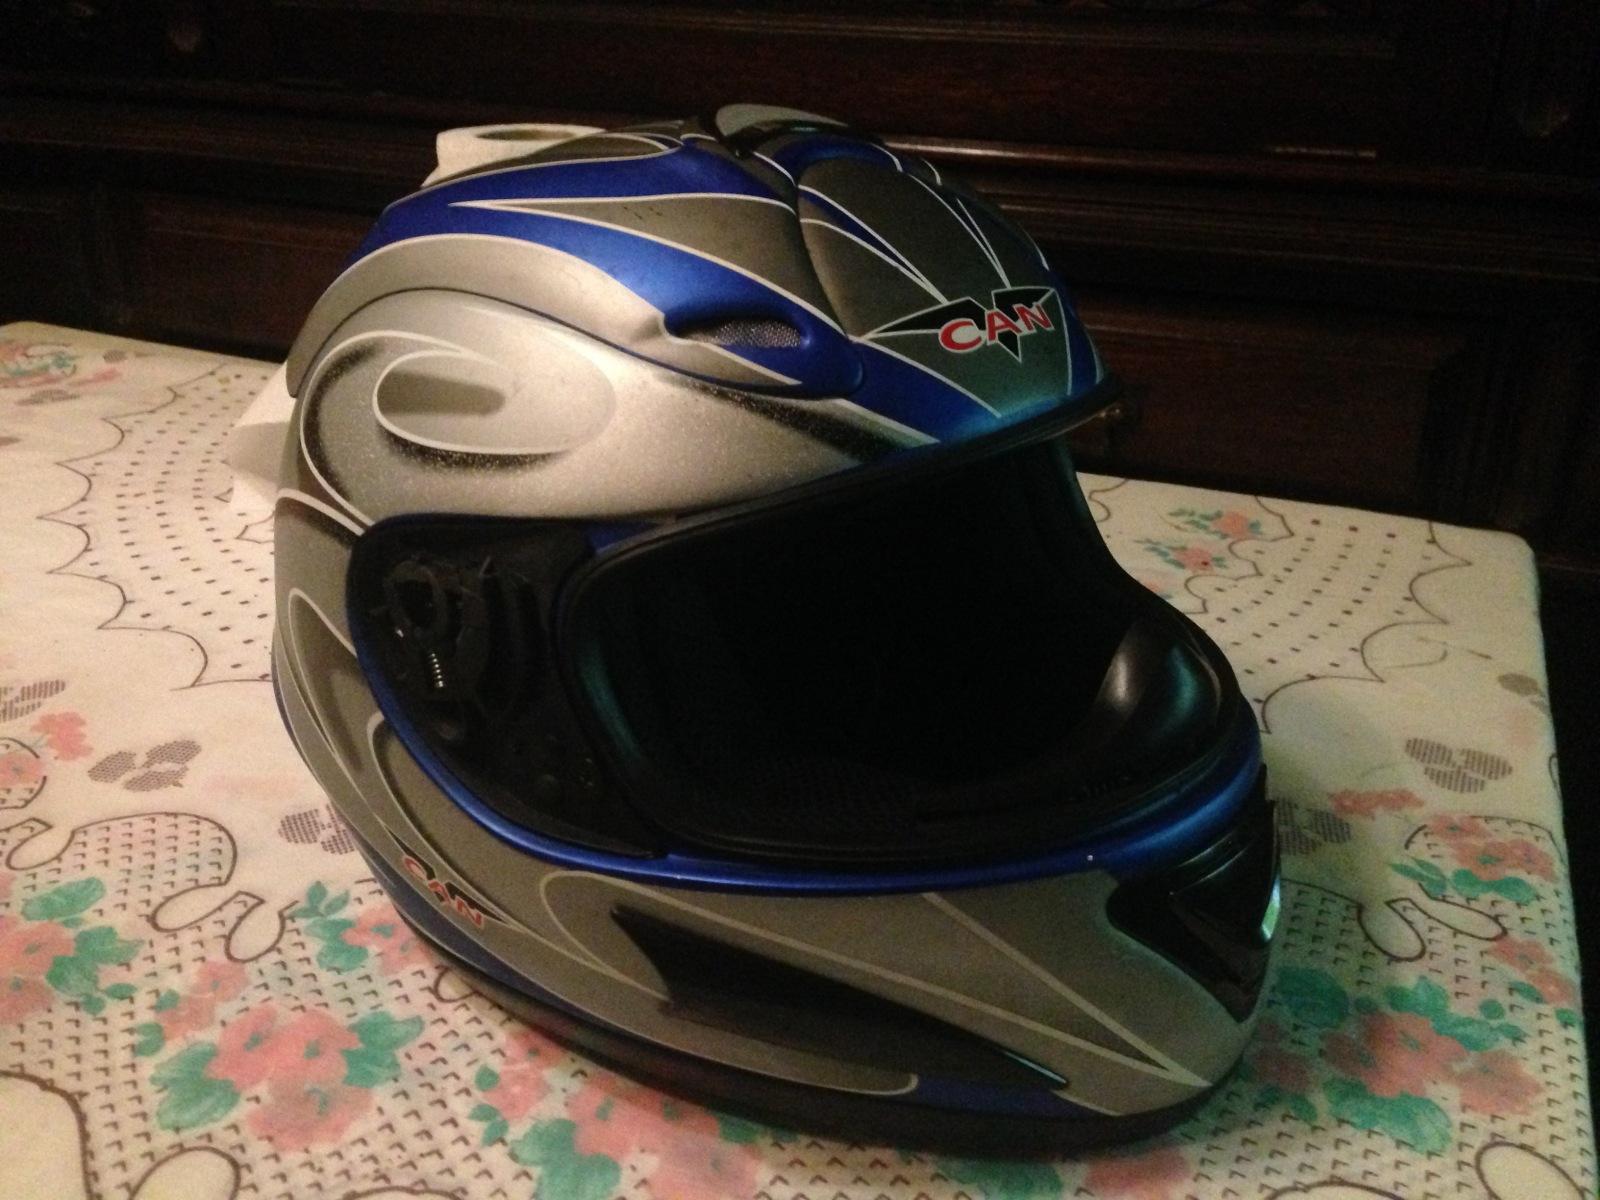 Autocolantes na moto/capacete  343oj08